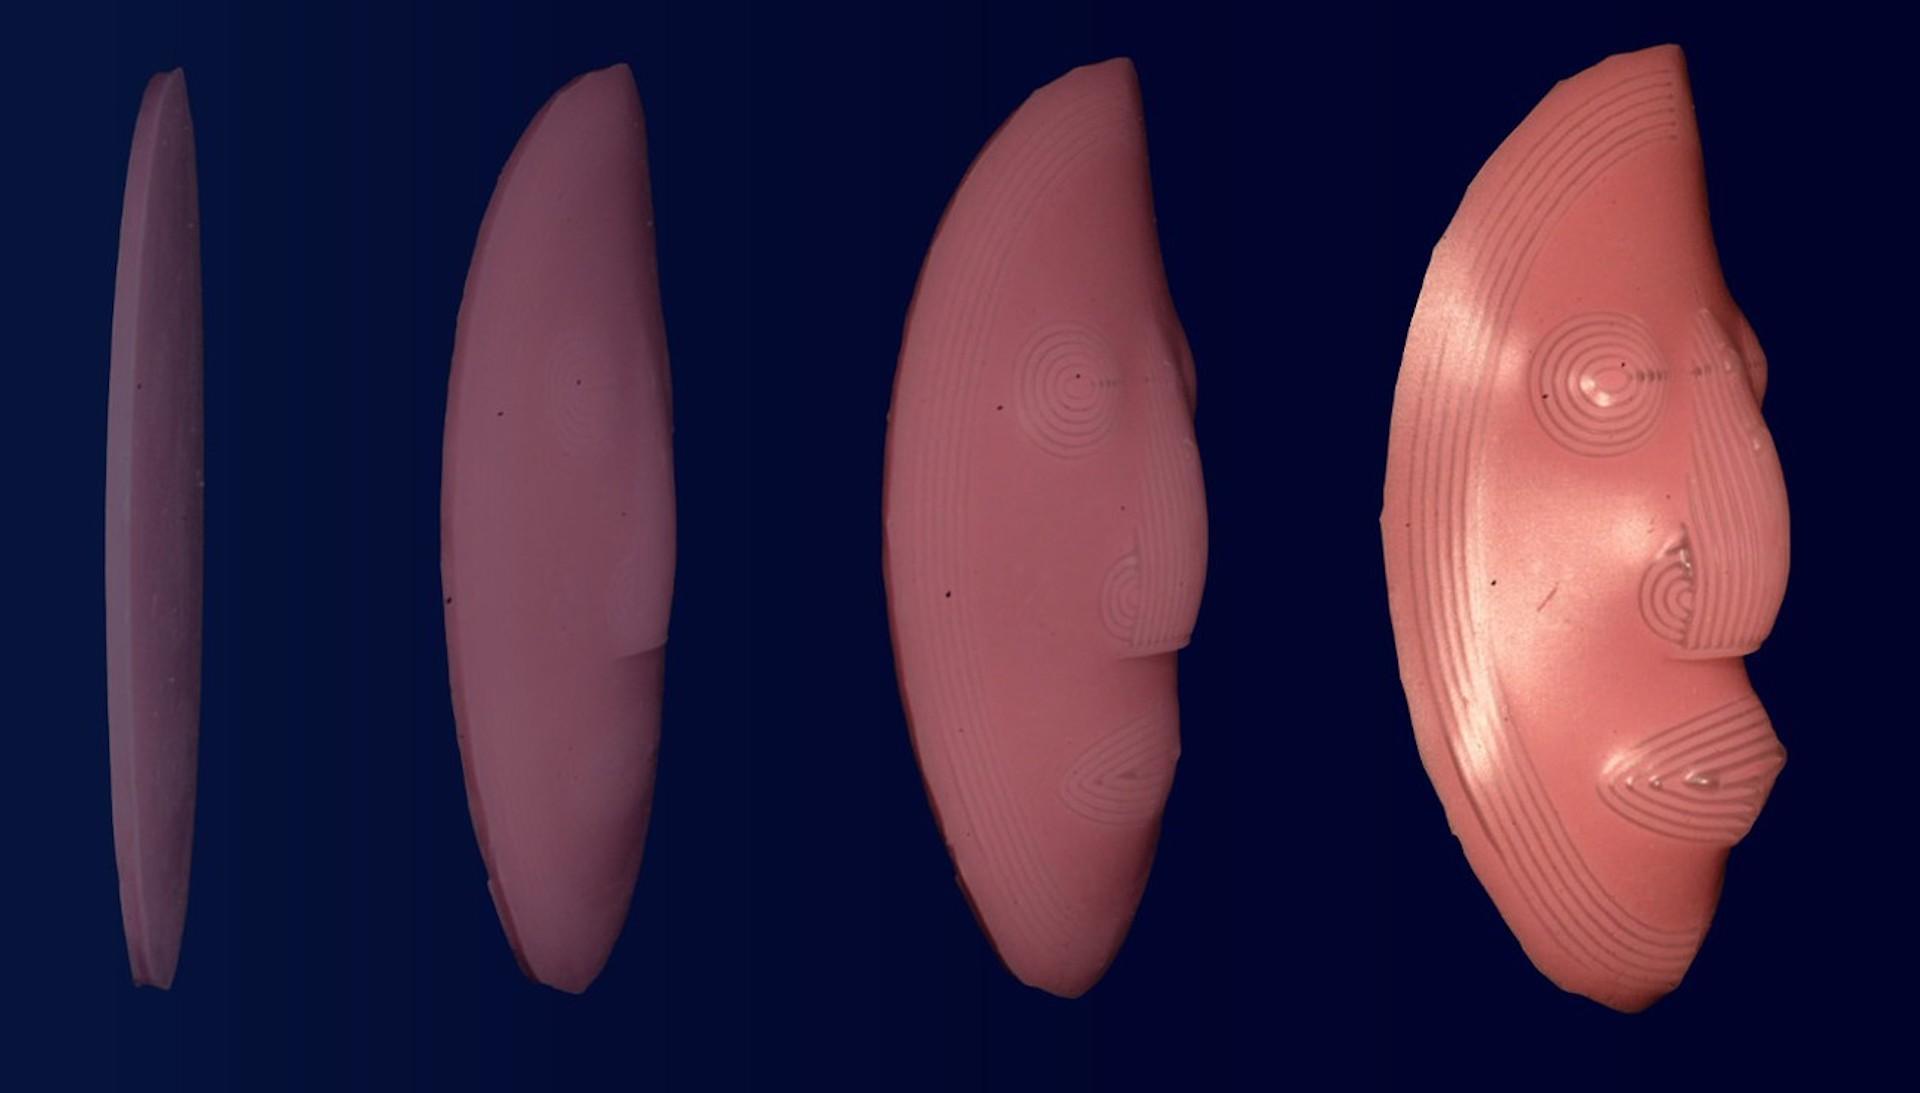 Baromorphe visage